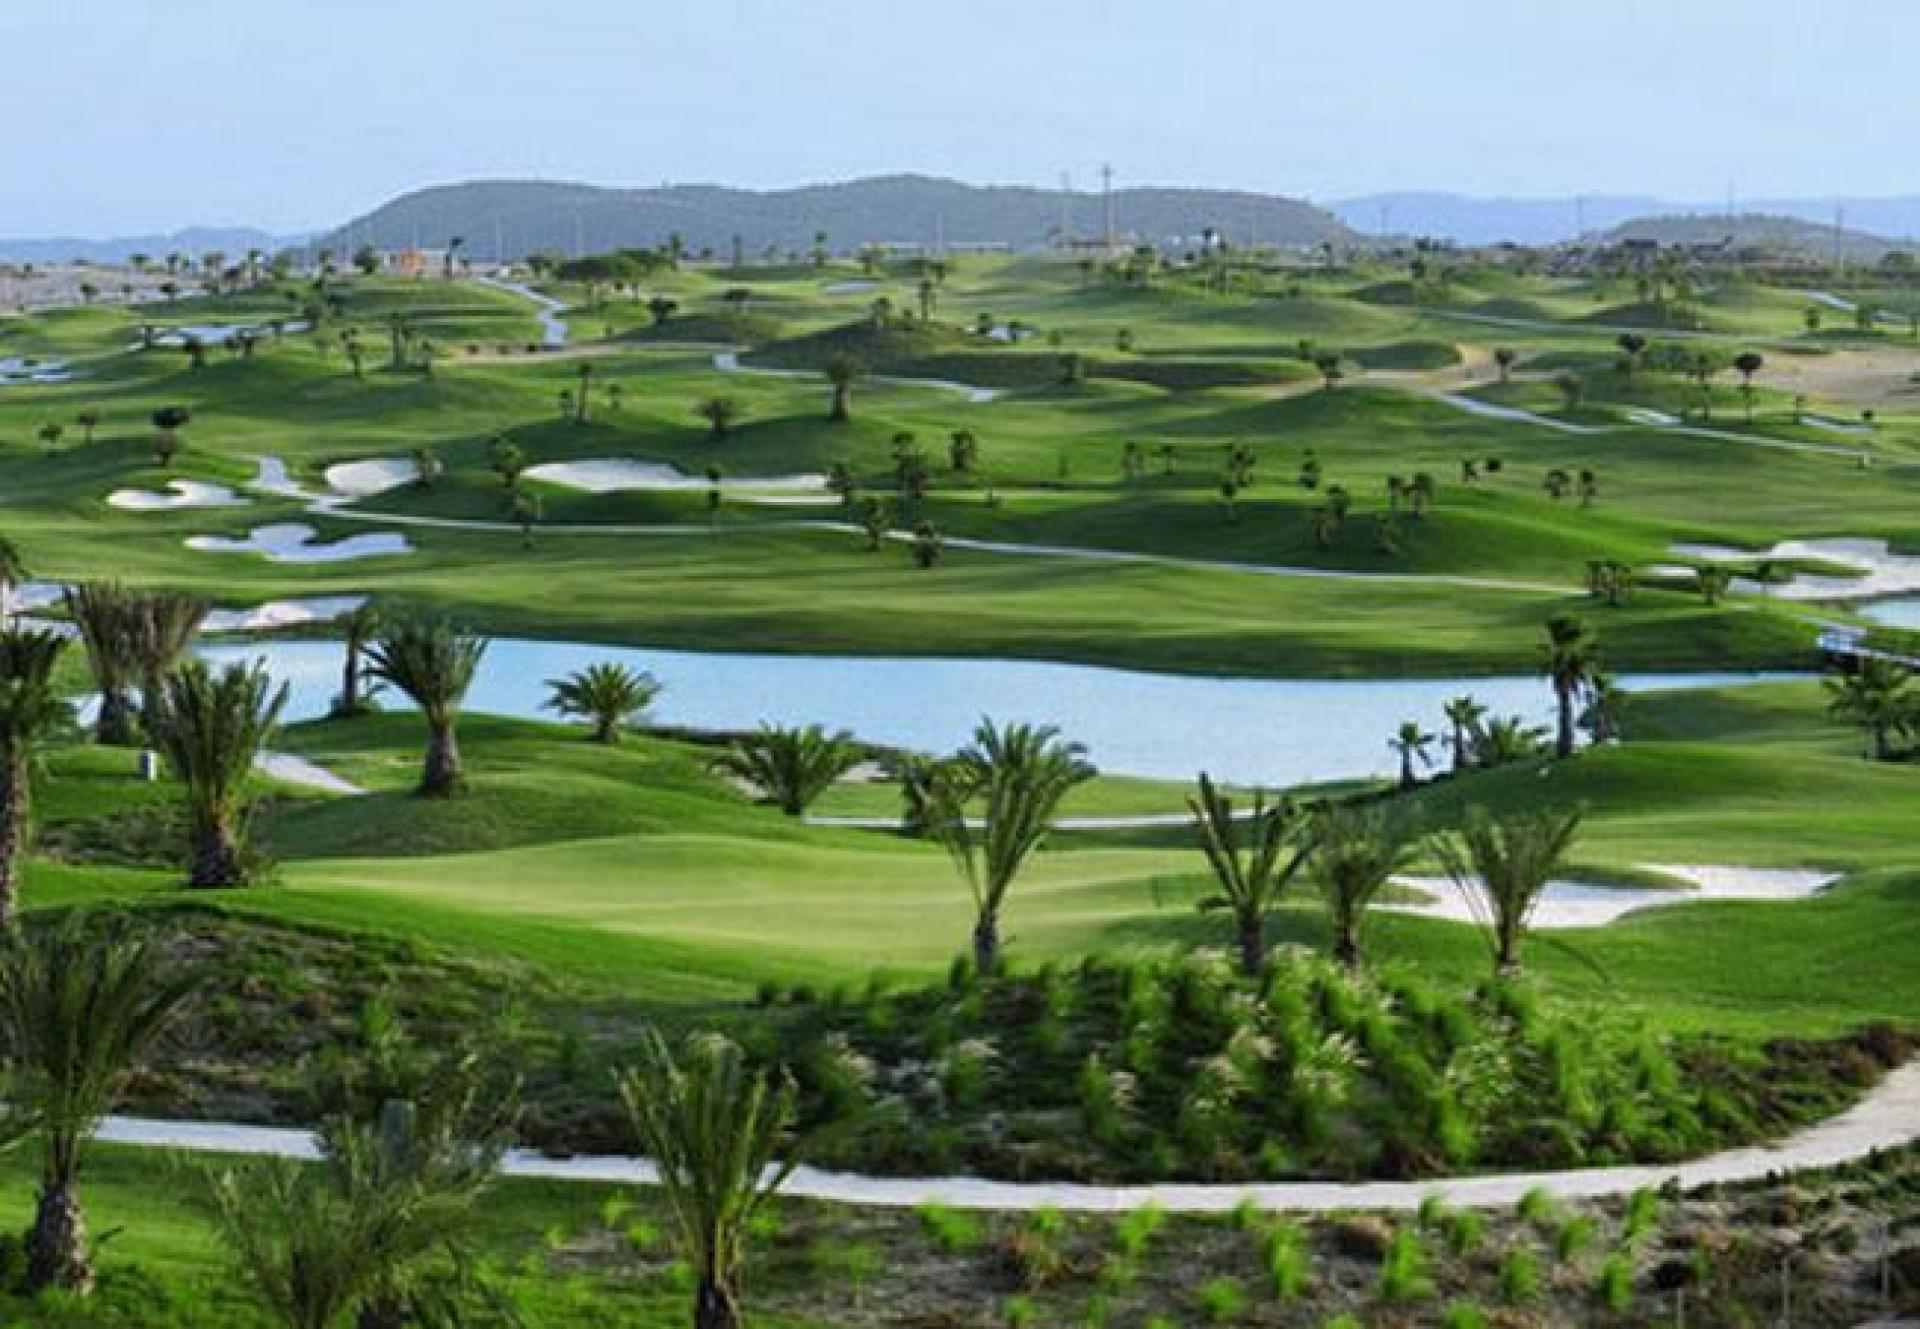 Maui villa - Vistabella golf (Alicante)